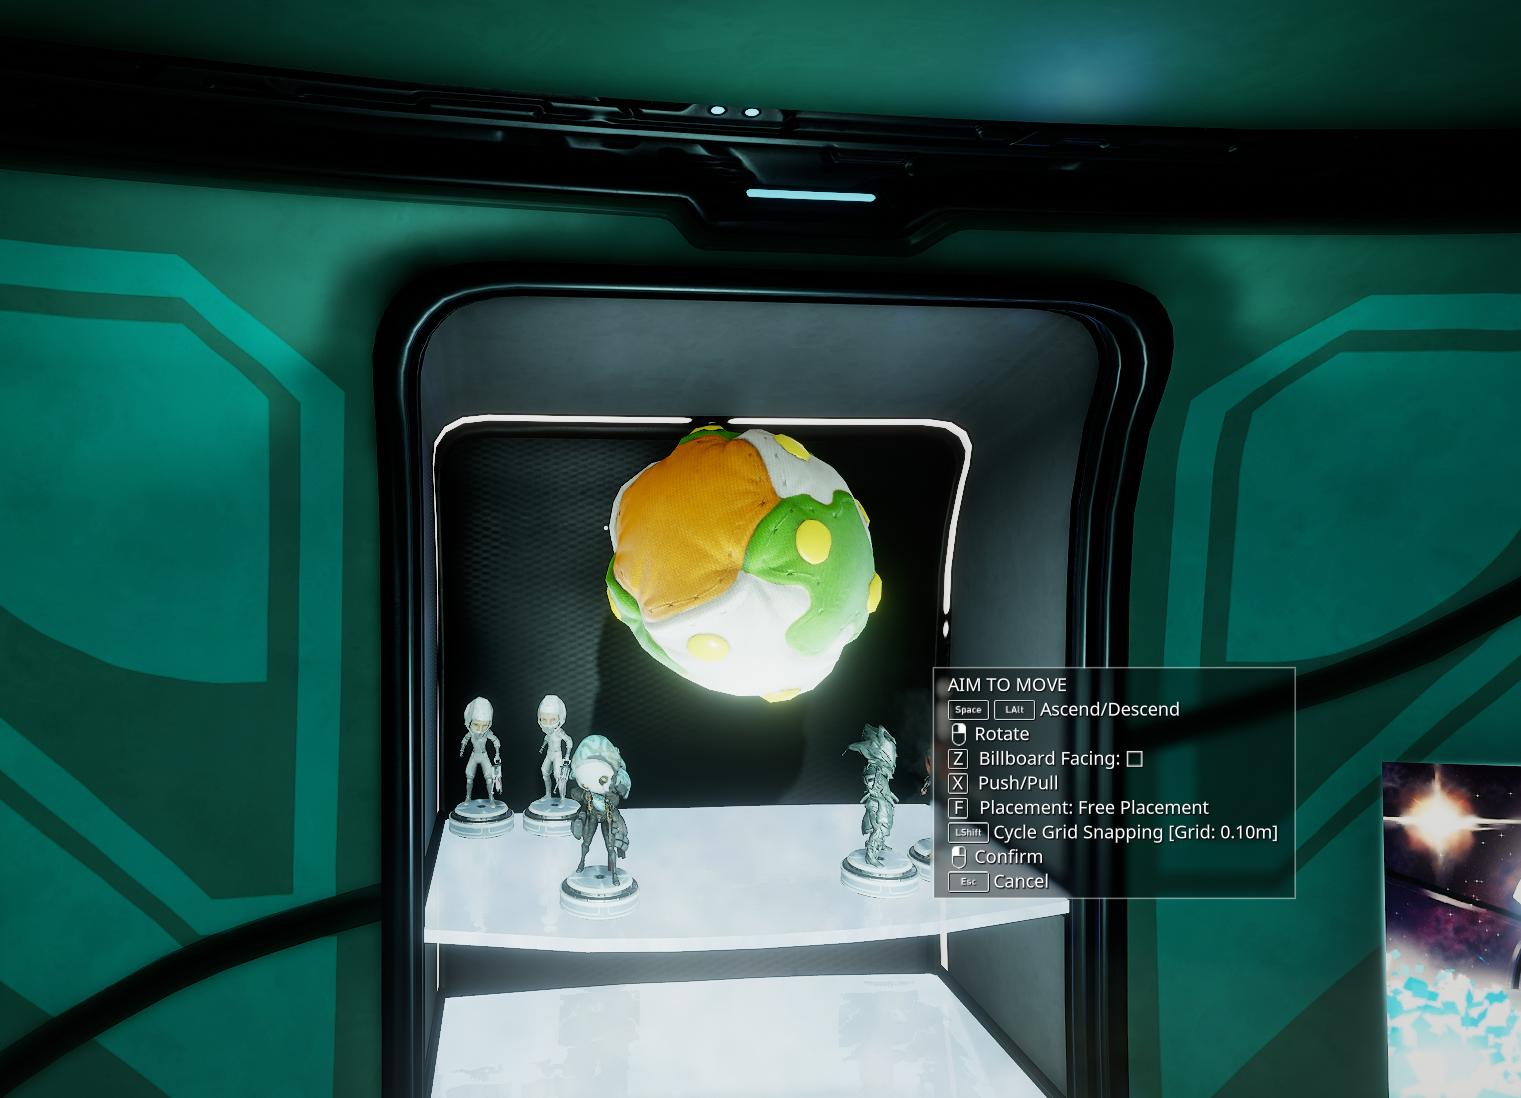 My floof fall outside of ship - PC Bugs - Warframe Forums